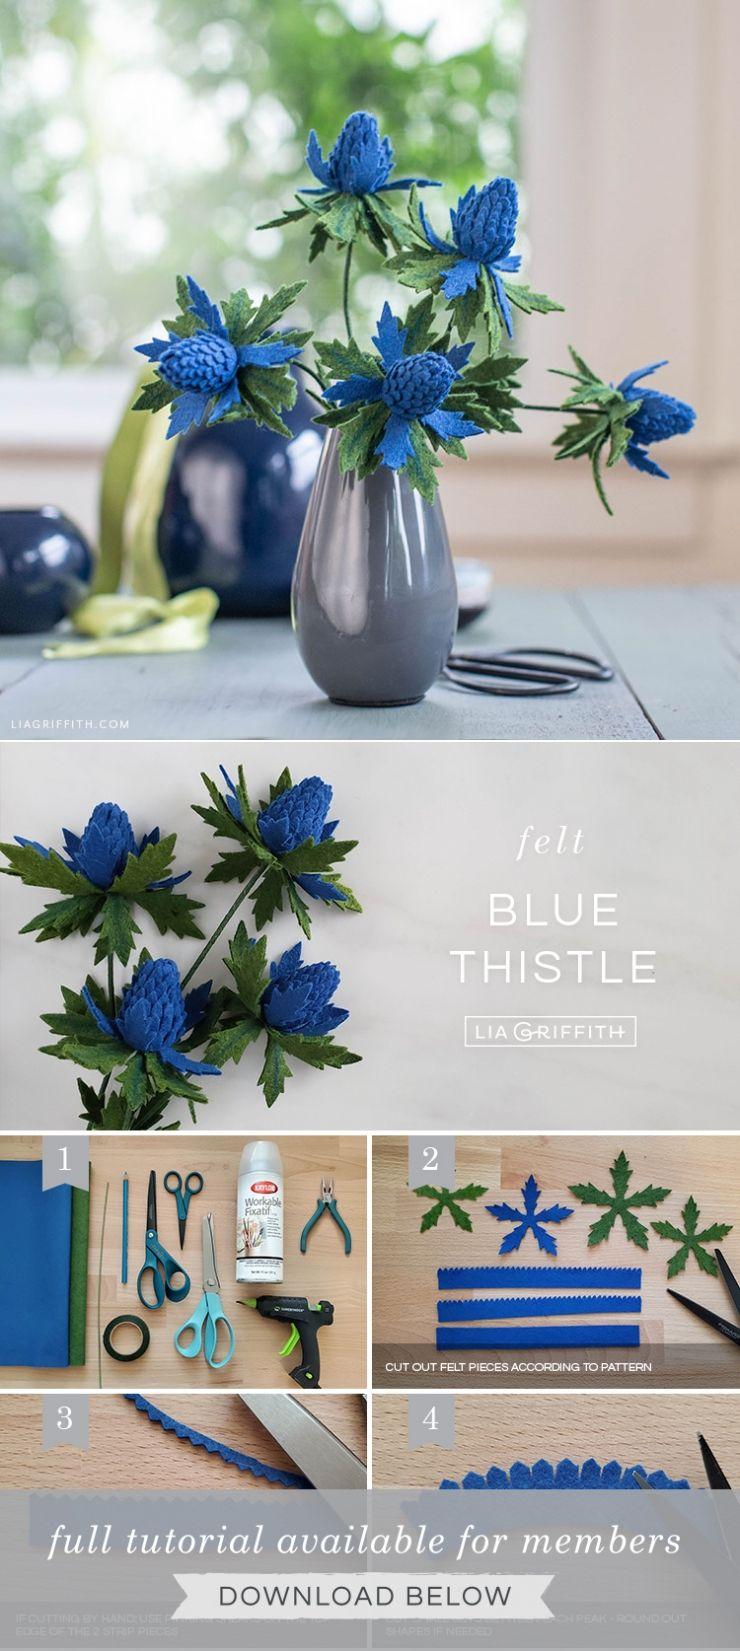 Felt Blue Thistle Flower Pattern & Tutorial - Lia Griffith #feltflower